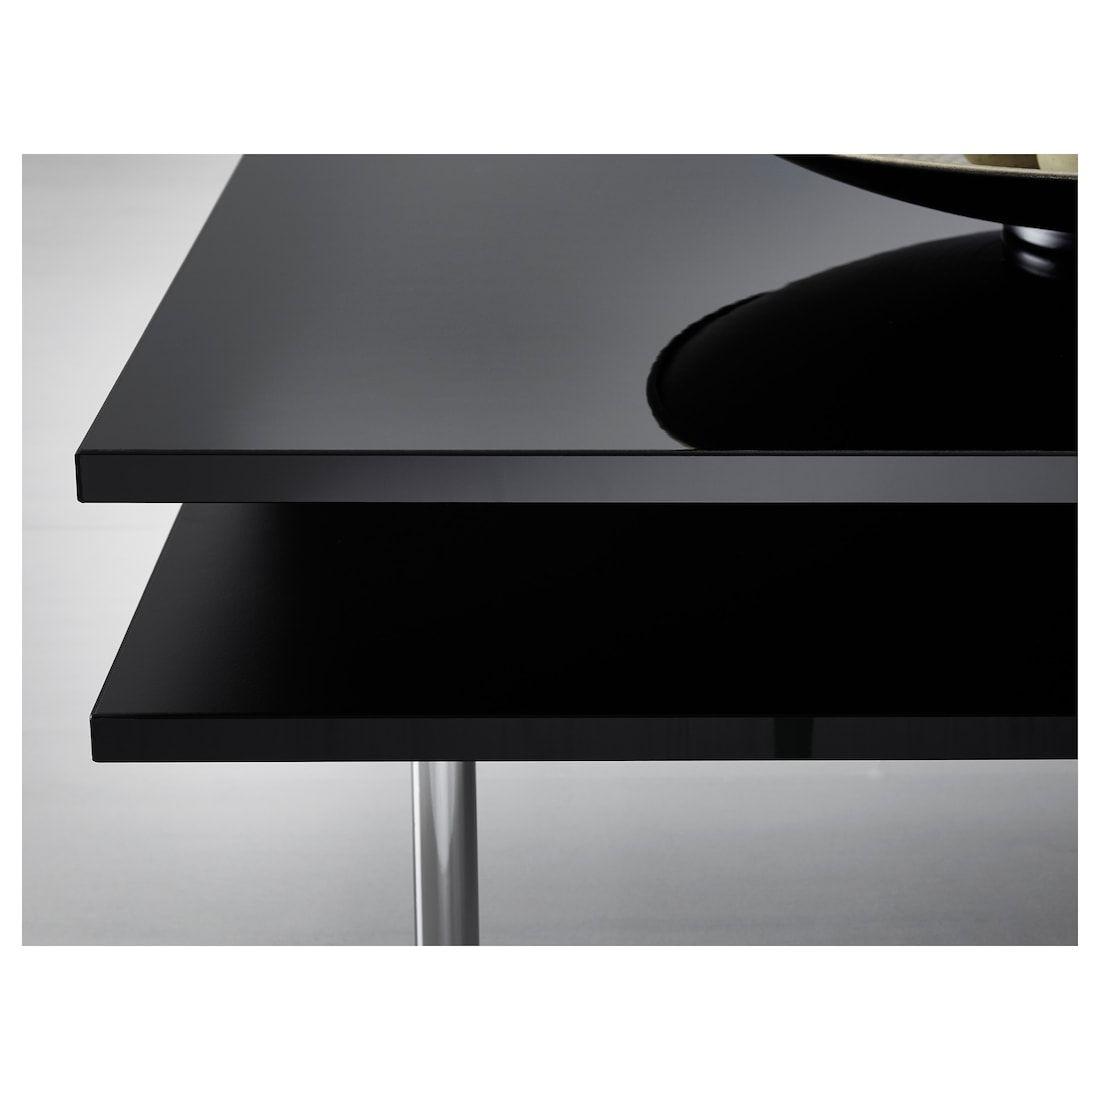 Tofteryd Coffee Table High Gloss Black 37 3 8x37 3 8 Ikea In 2021 Coffee Table High Gloss Black Coffee Tables Bedside Table Metal [ 1100 x 1100 Pixel ]